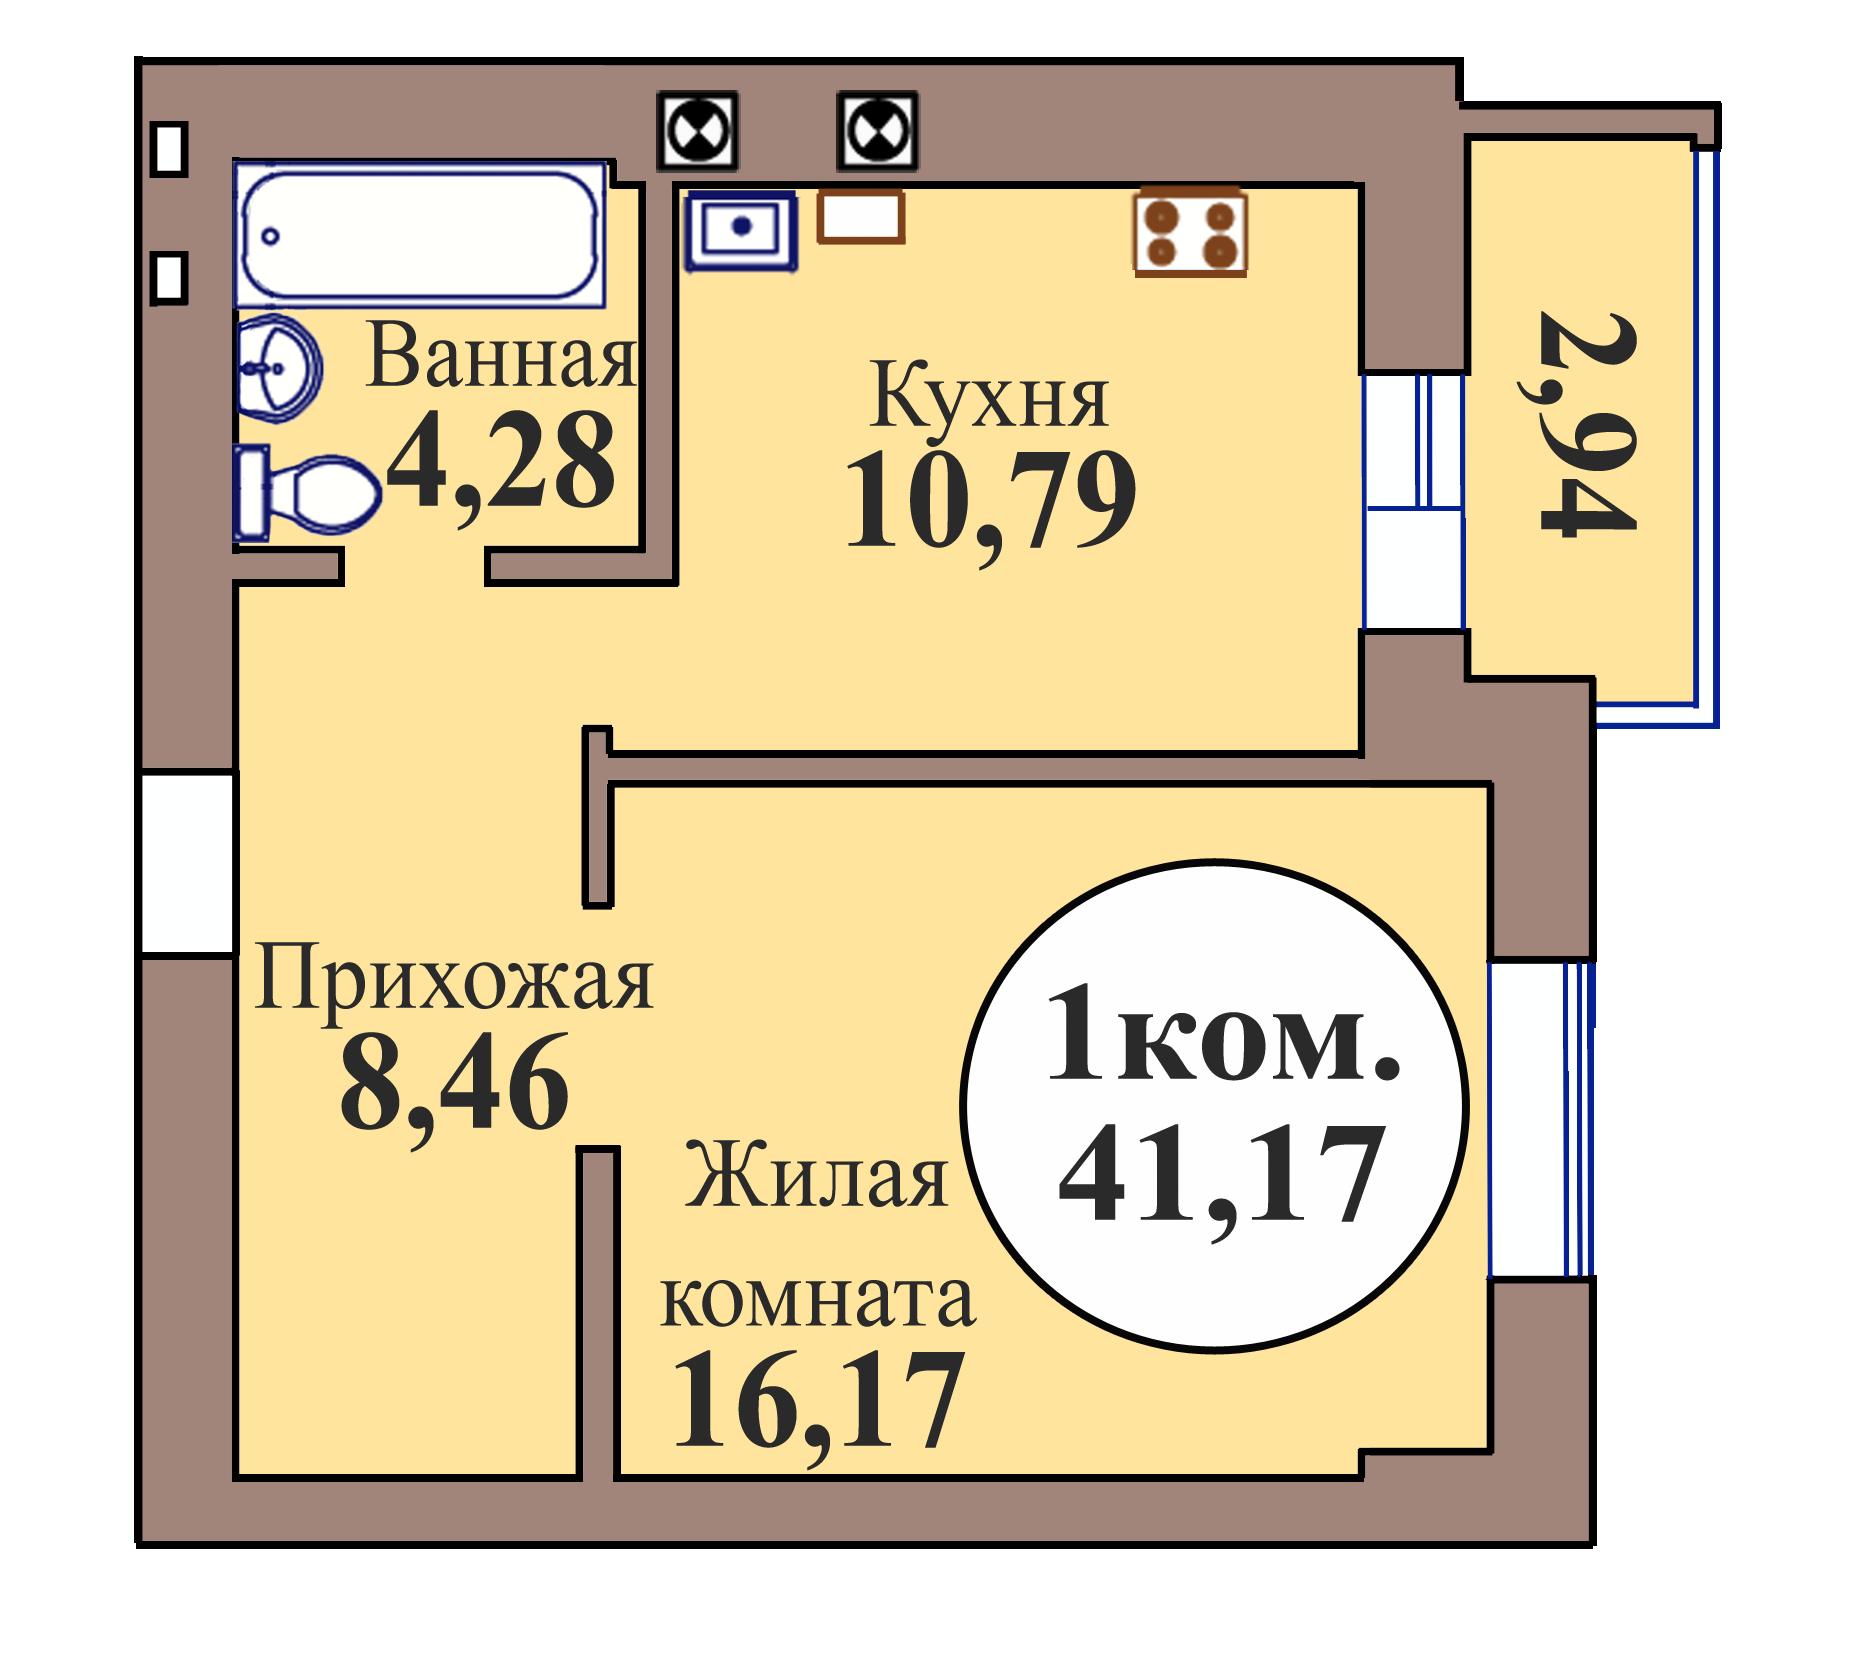 1-комн. кв. по ГП дом №3, МКР Васильково, кв. 112 в Калининграде